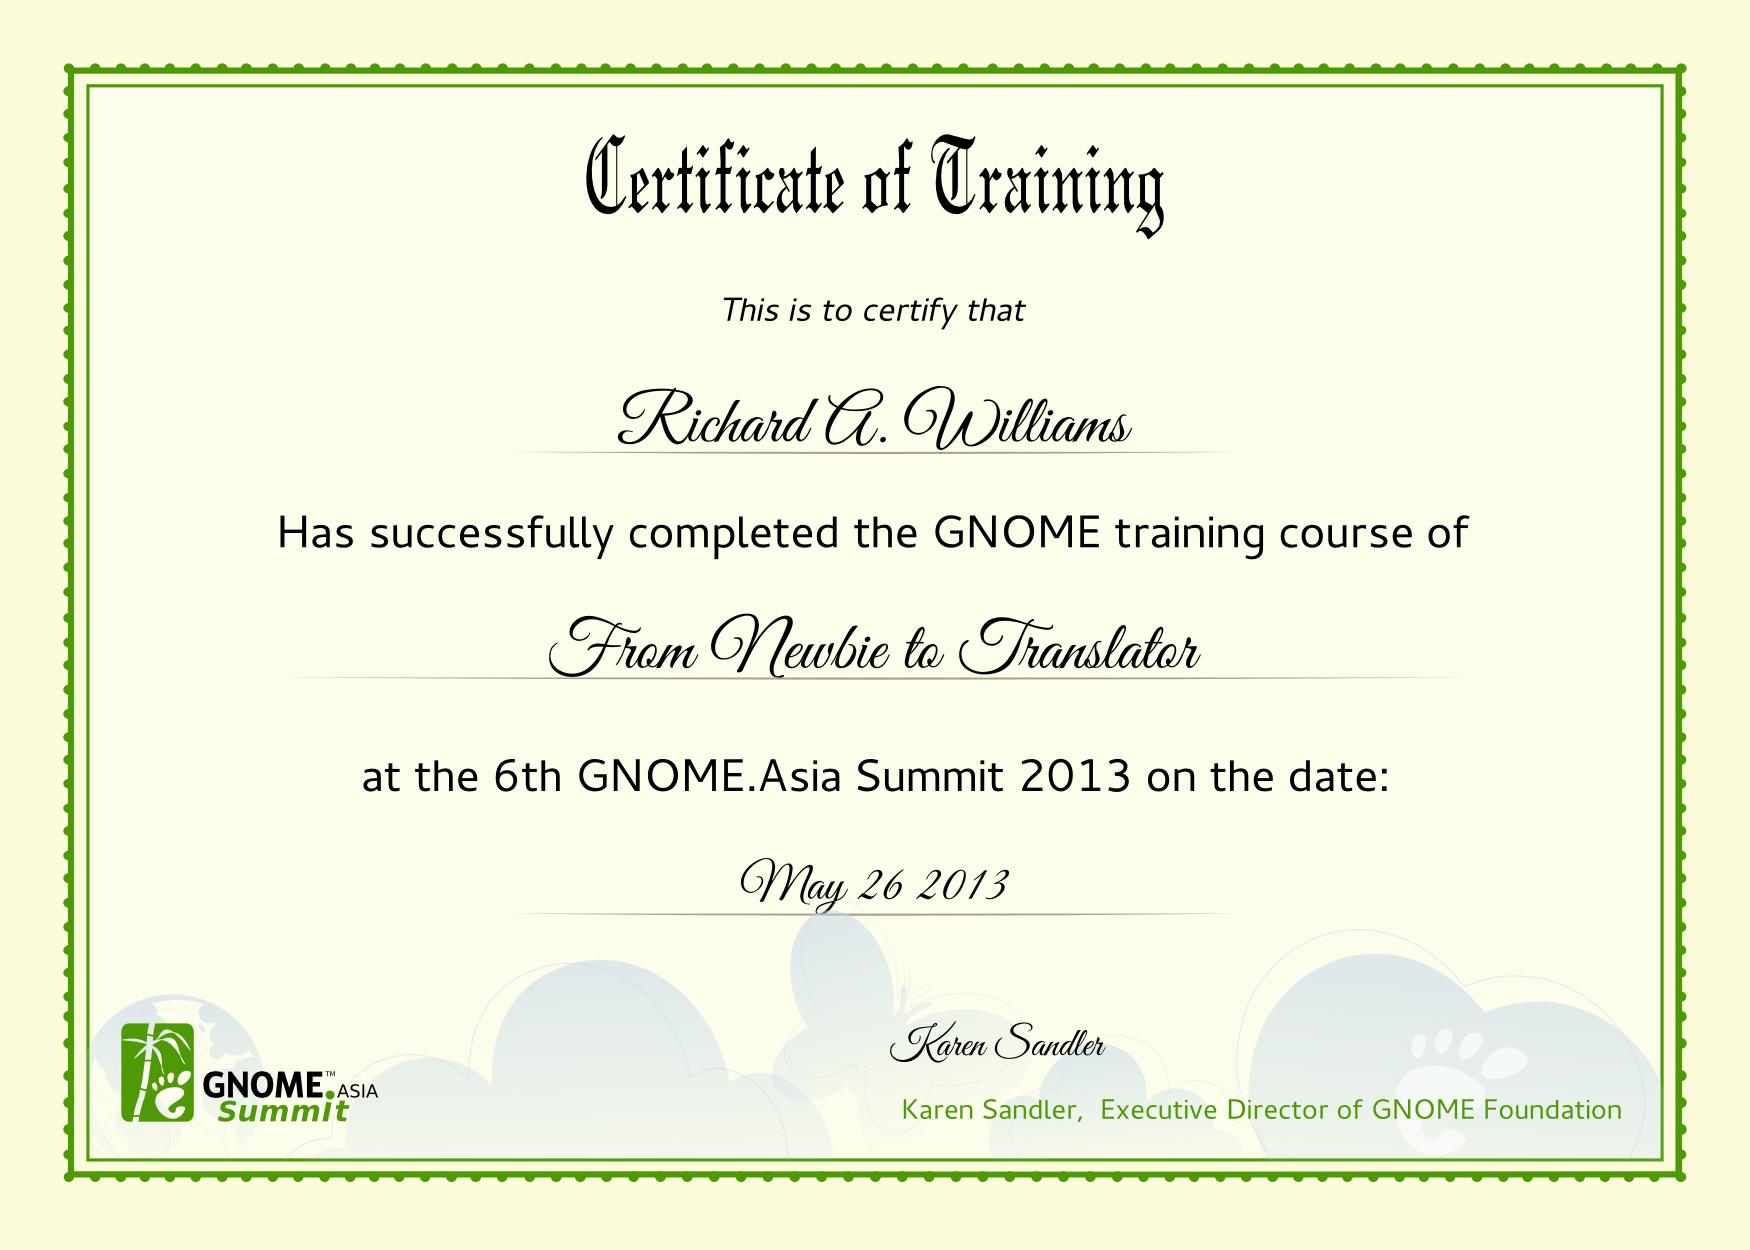 Leadership Award Certificate Template  Best Template Ideas in Printable Leadership Award Certificate Templates